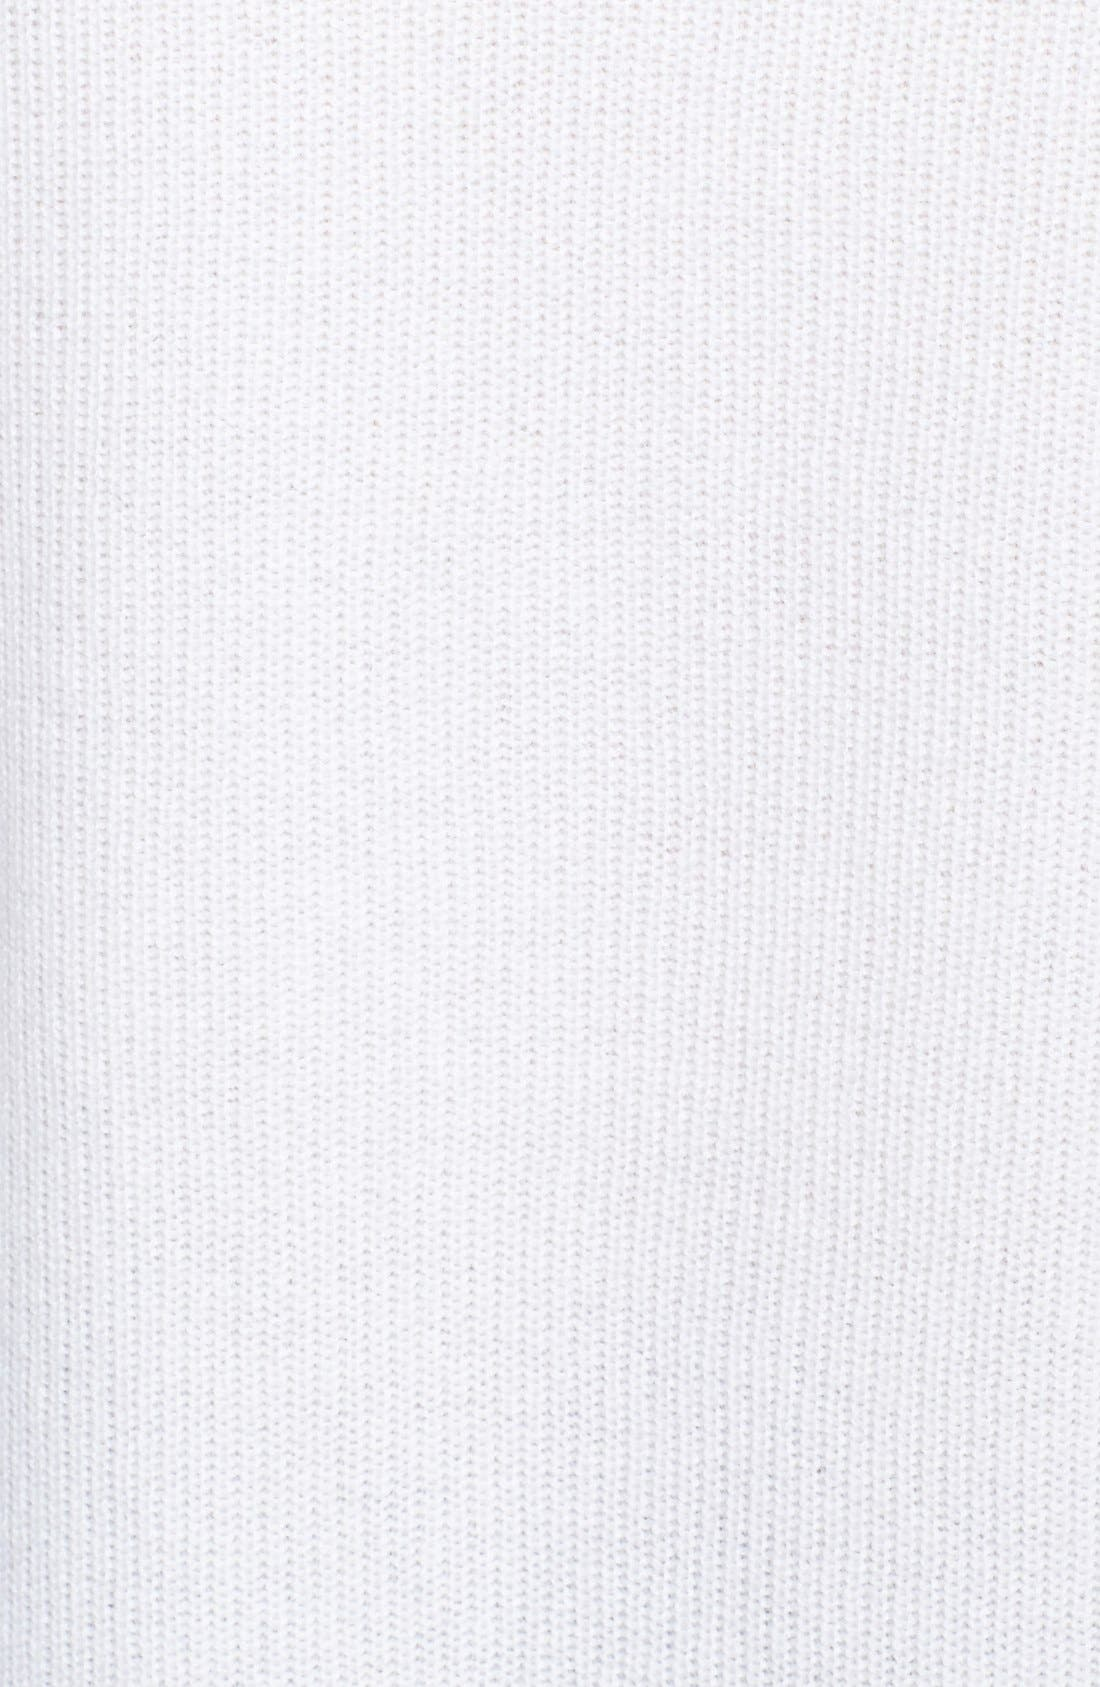 Alternate Image 3  - rag & bone 'Talia' V-Neck Cashmere Sweater